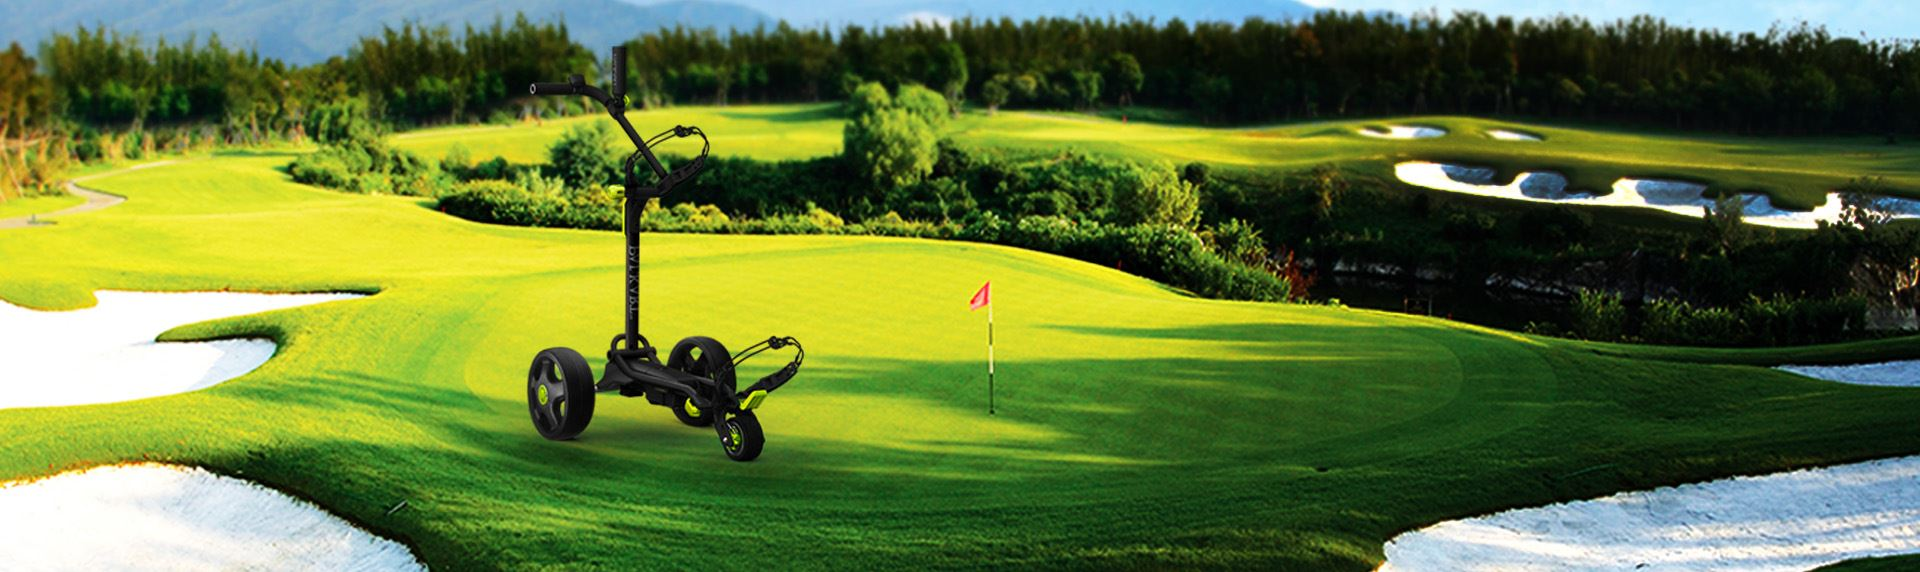 TMT娱乐-电动高尔夫球包车